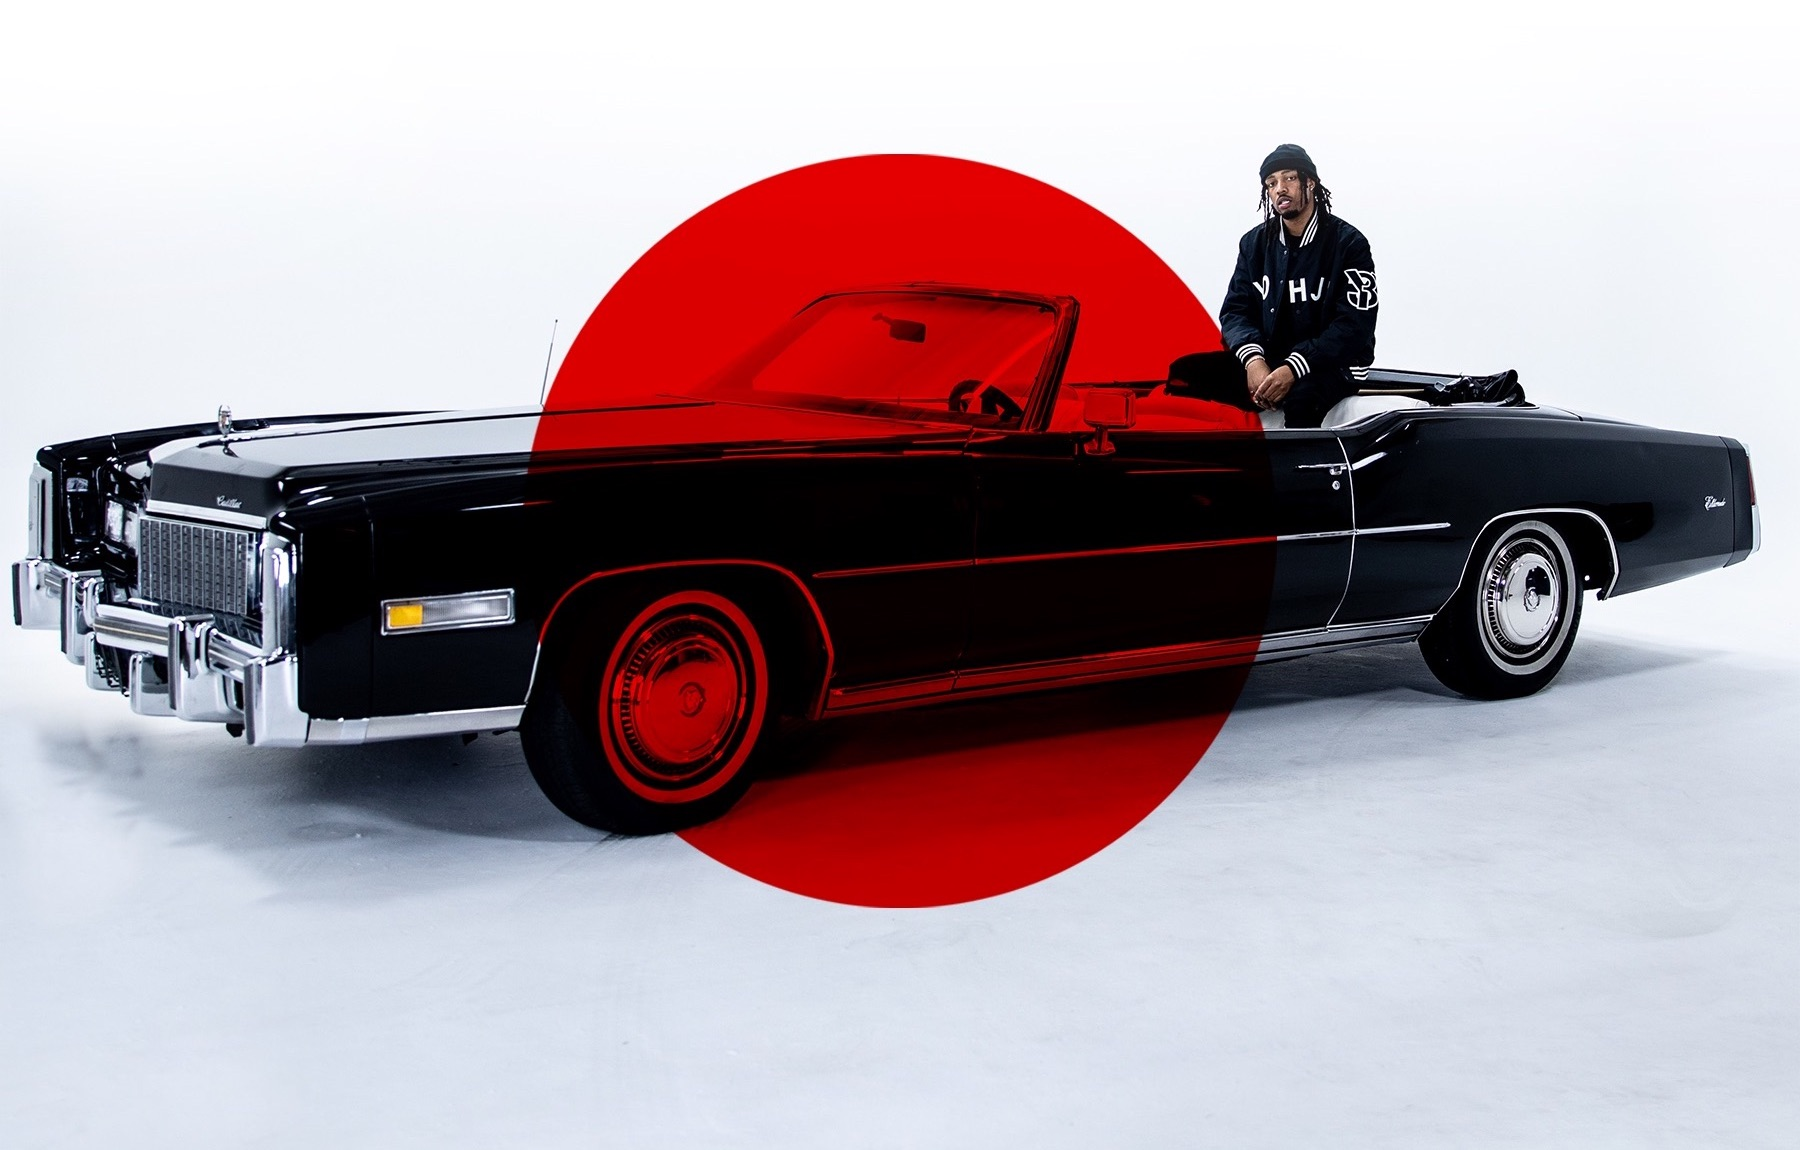 1$Tが東京を舞台にしたドキュメンタリー「Tokyo The Movie」をリリース